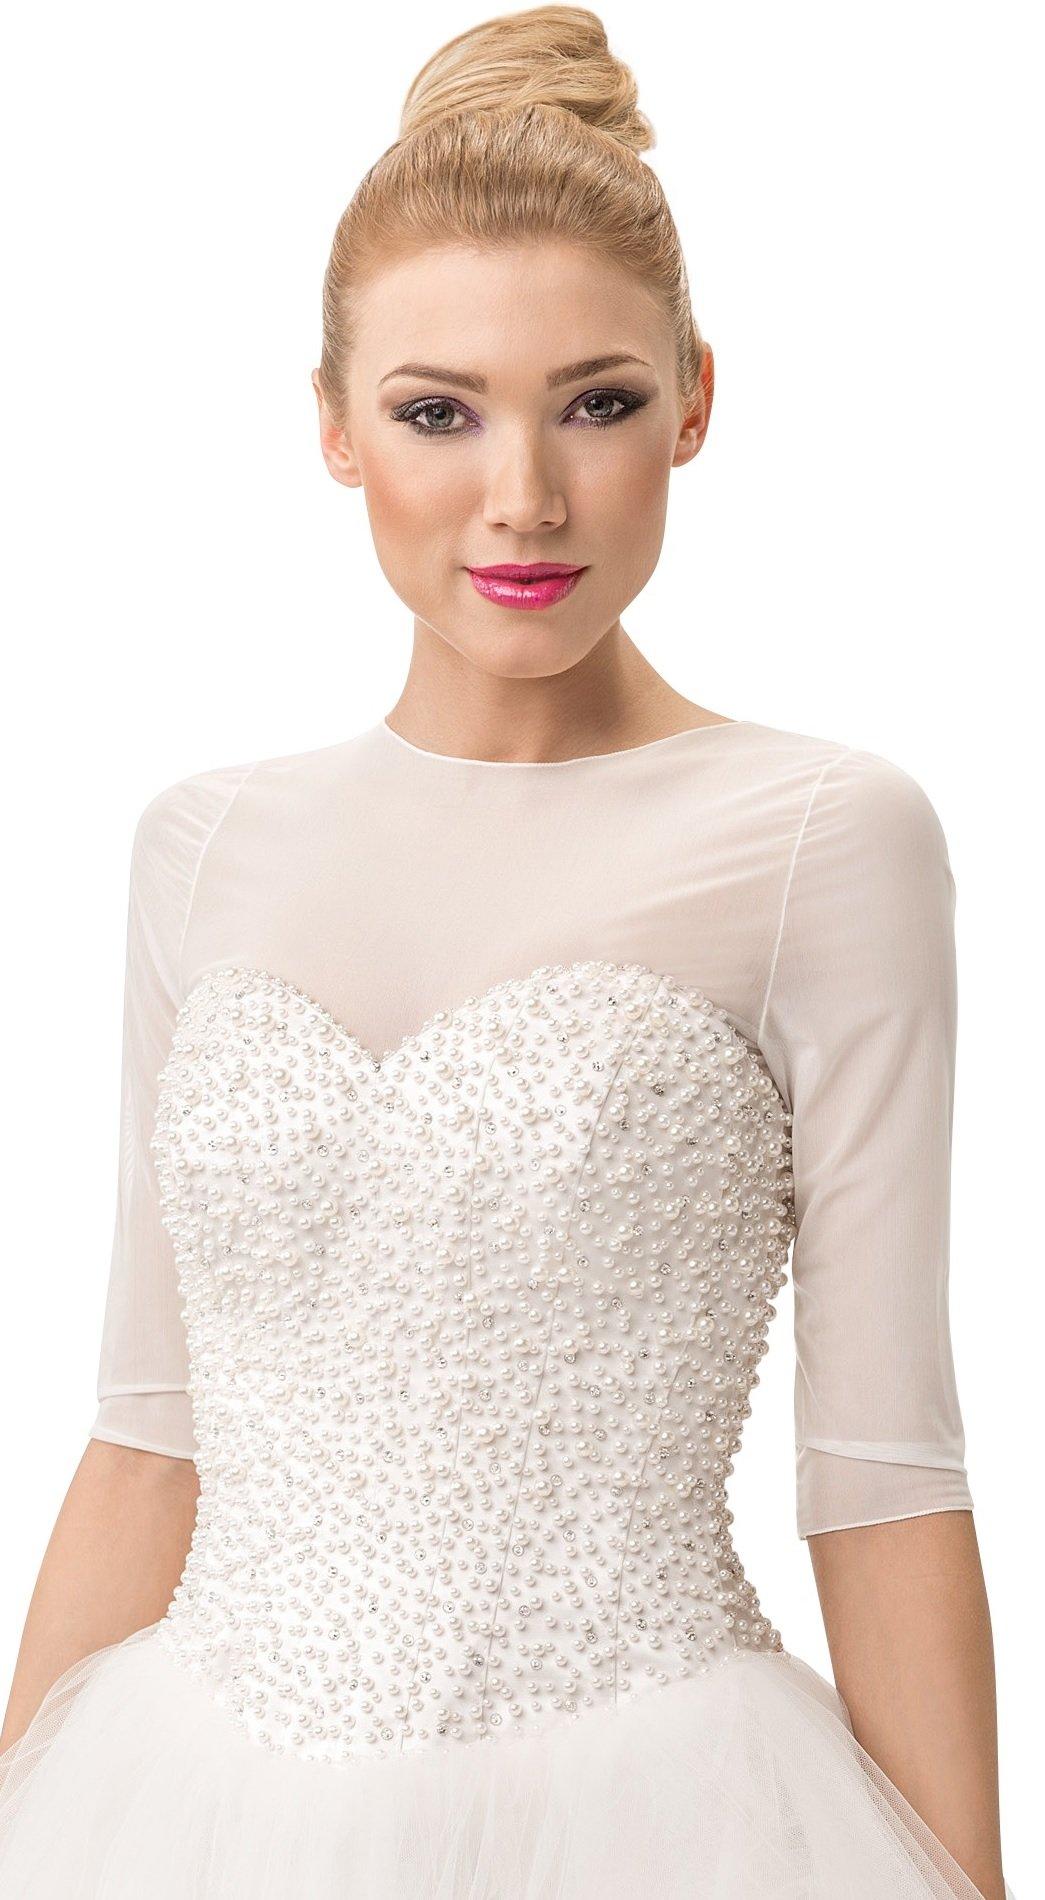 Bridal Tulle Bolero Shrug Dress T-Shirt Wedding Jacket